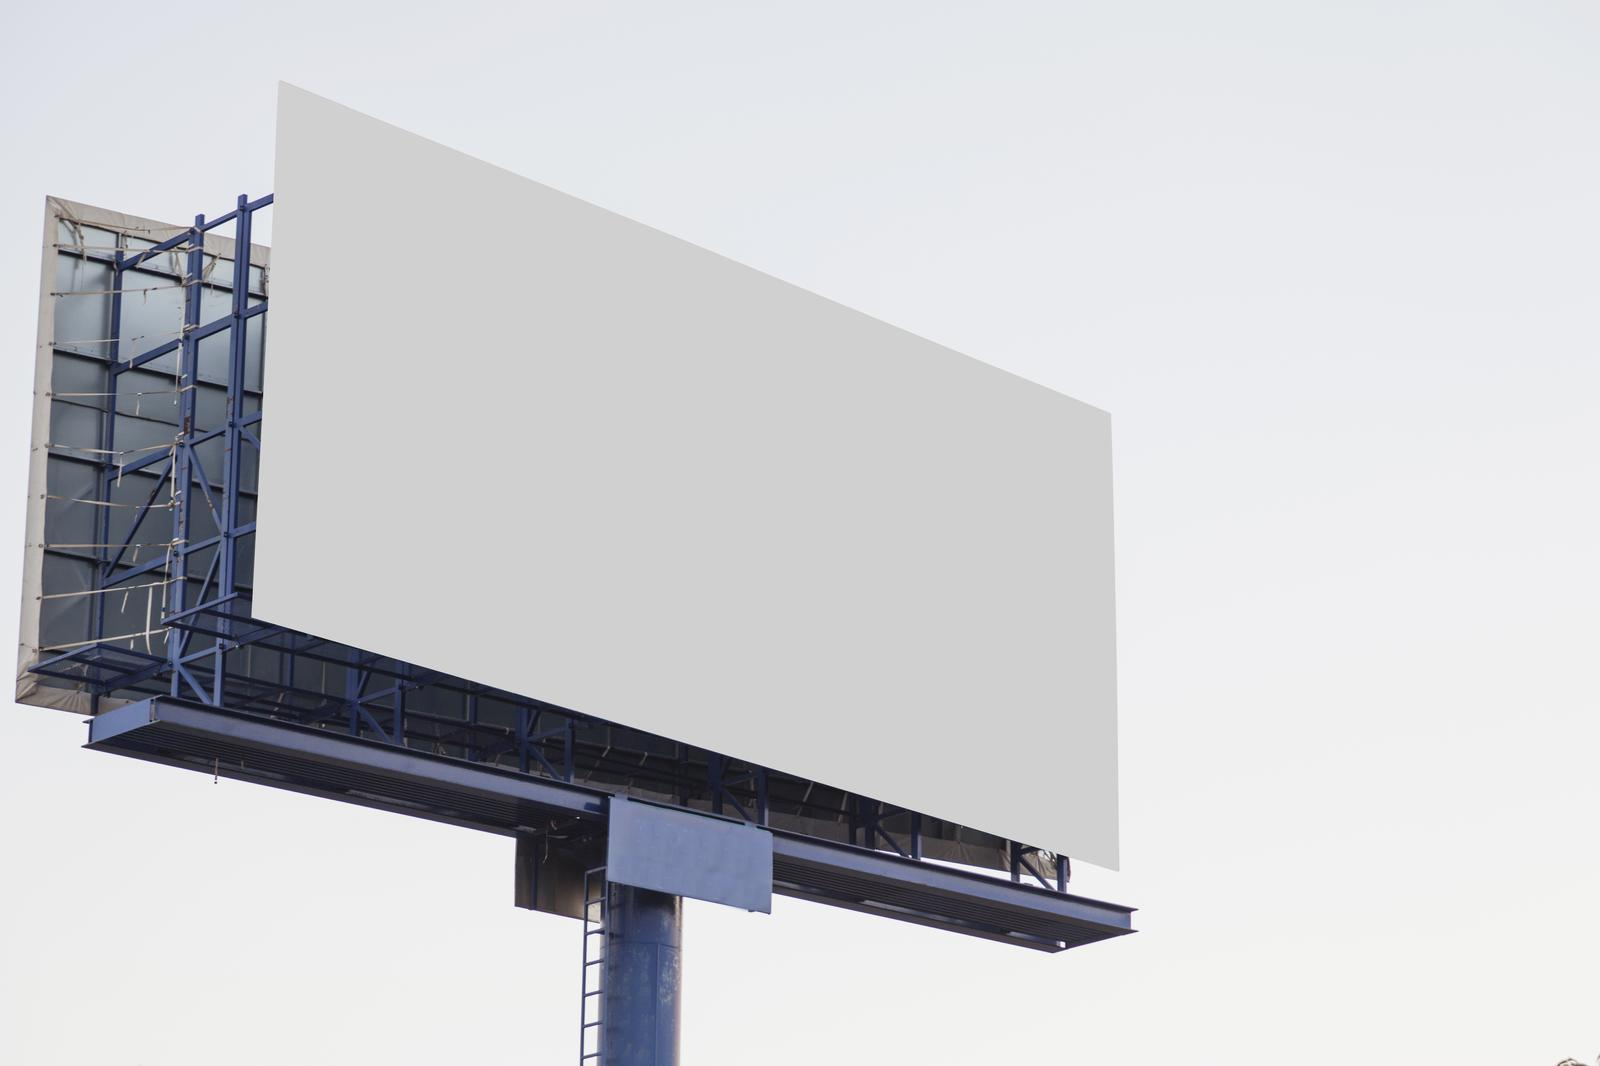 Reklaamiagentuurid Tallinnas